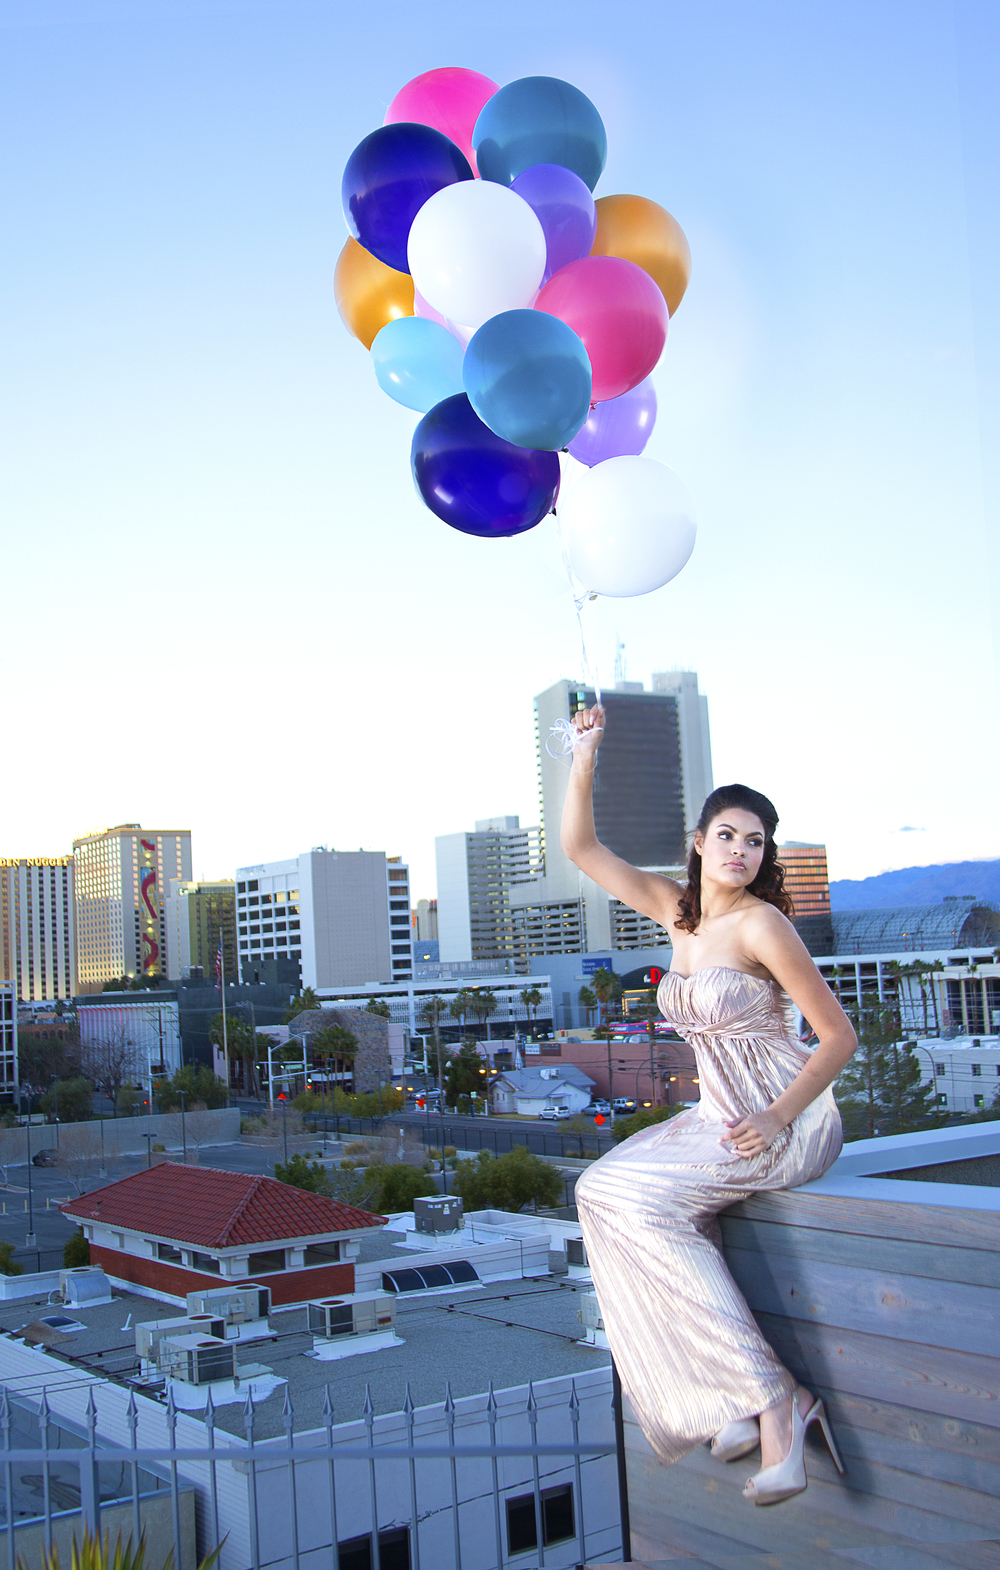 balloons22.jpg